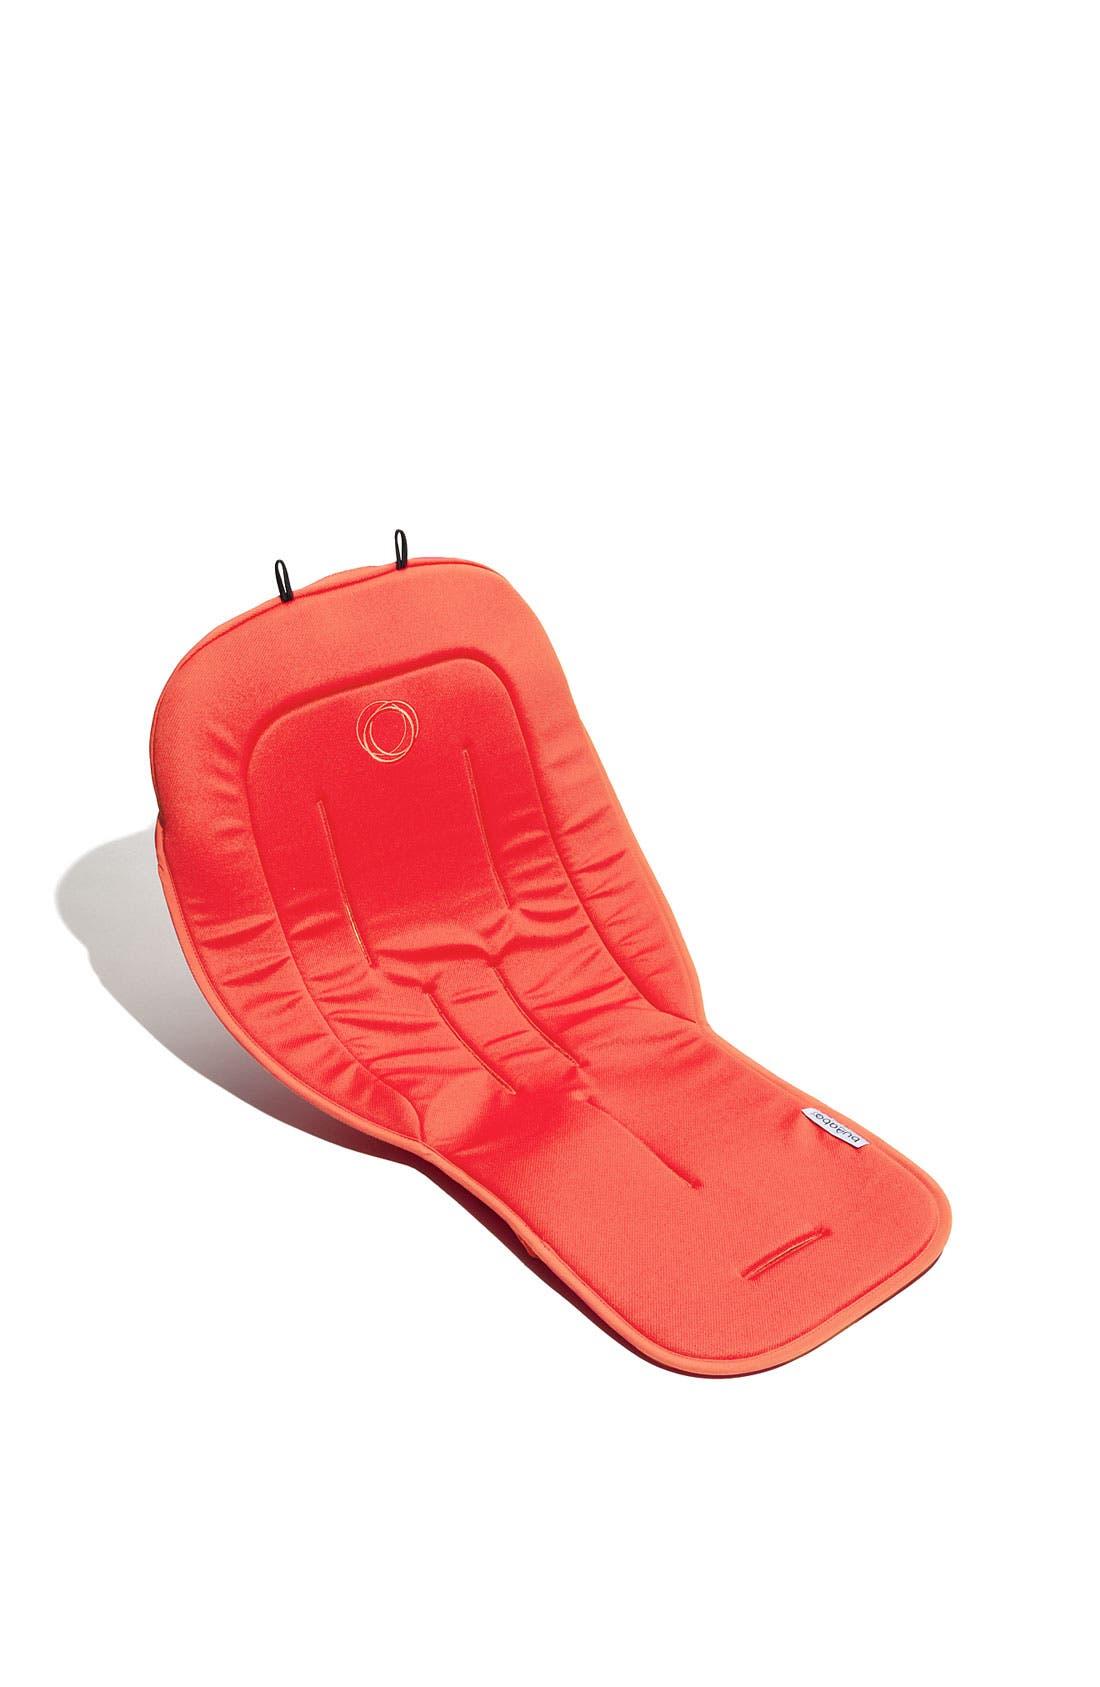 Bugaboo Universal Stroller Seat Liner